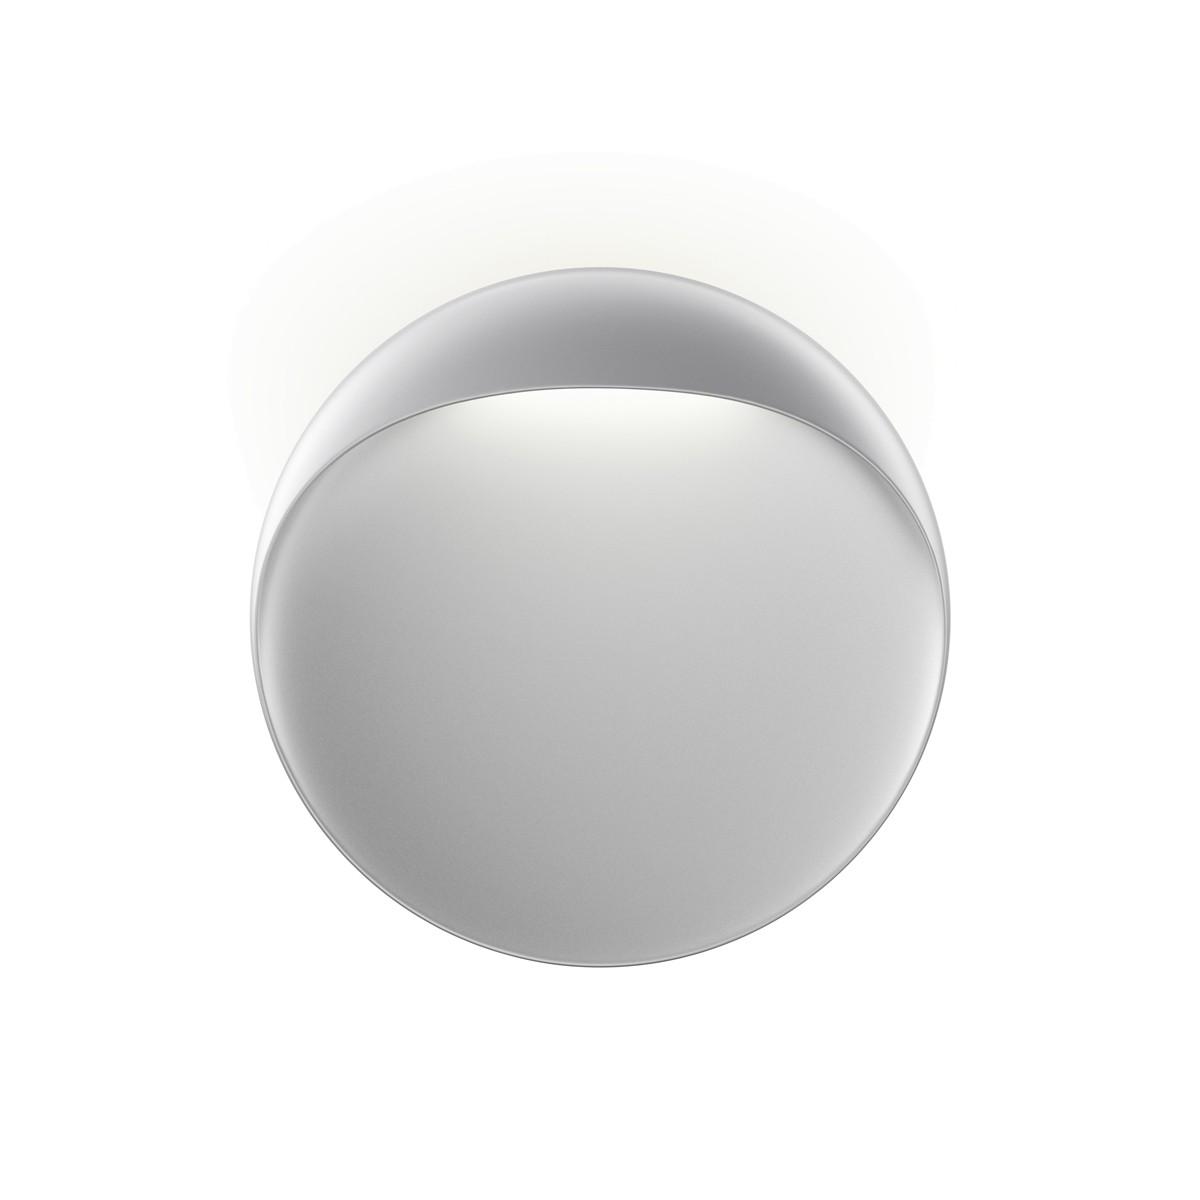 Louis Poulsen Flindt LED Wandleuchte, Ø: 30 cm, 2700 K, aluminiumfarben